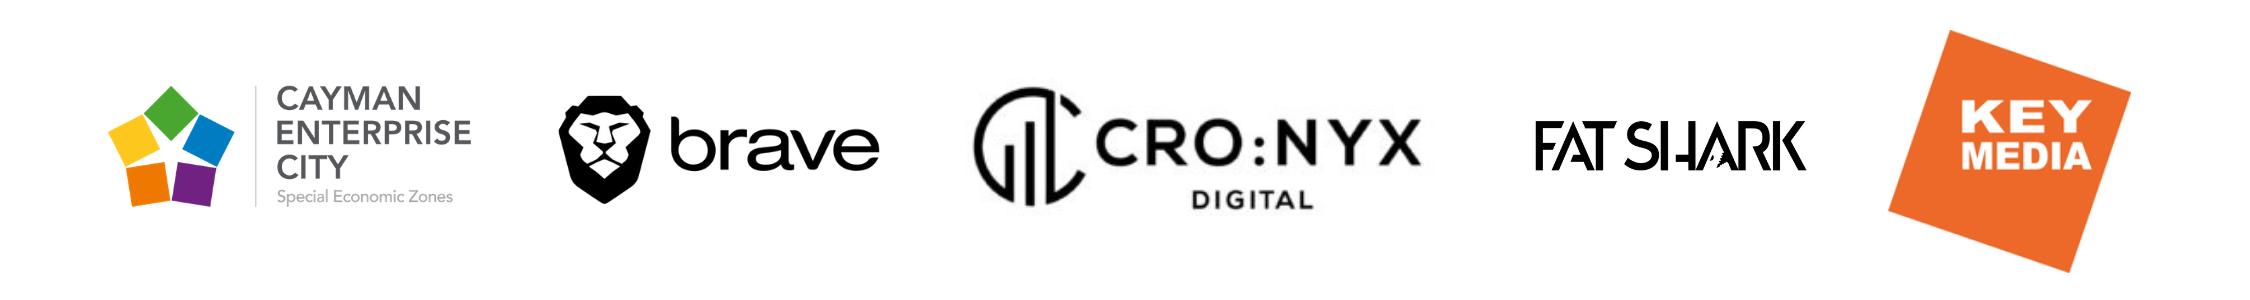 Sponsor Logos Enterprise Cayman